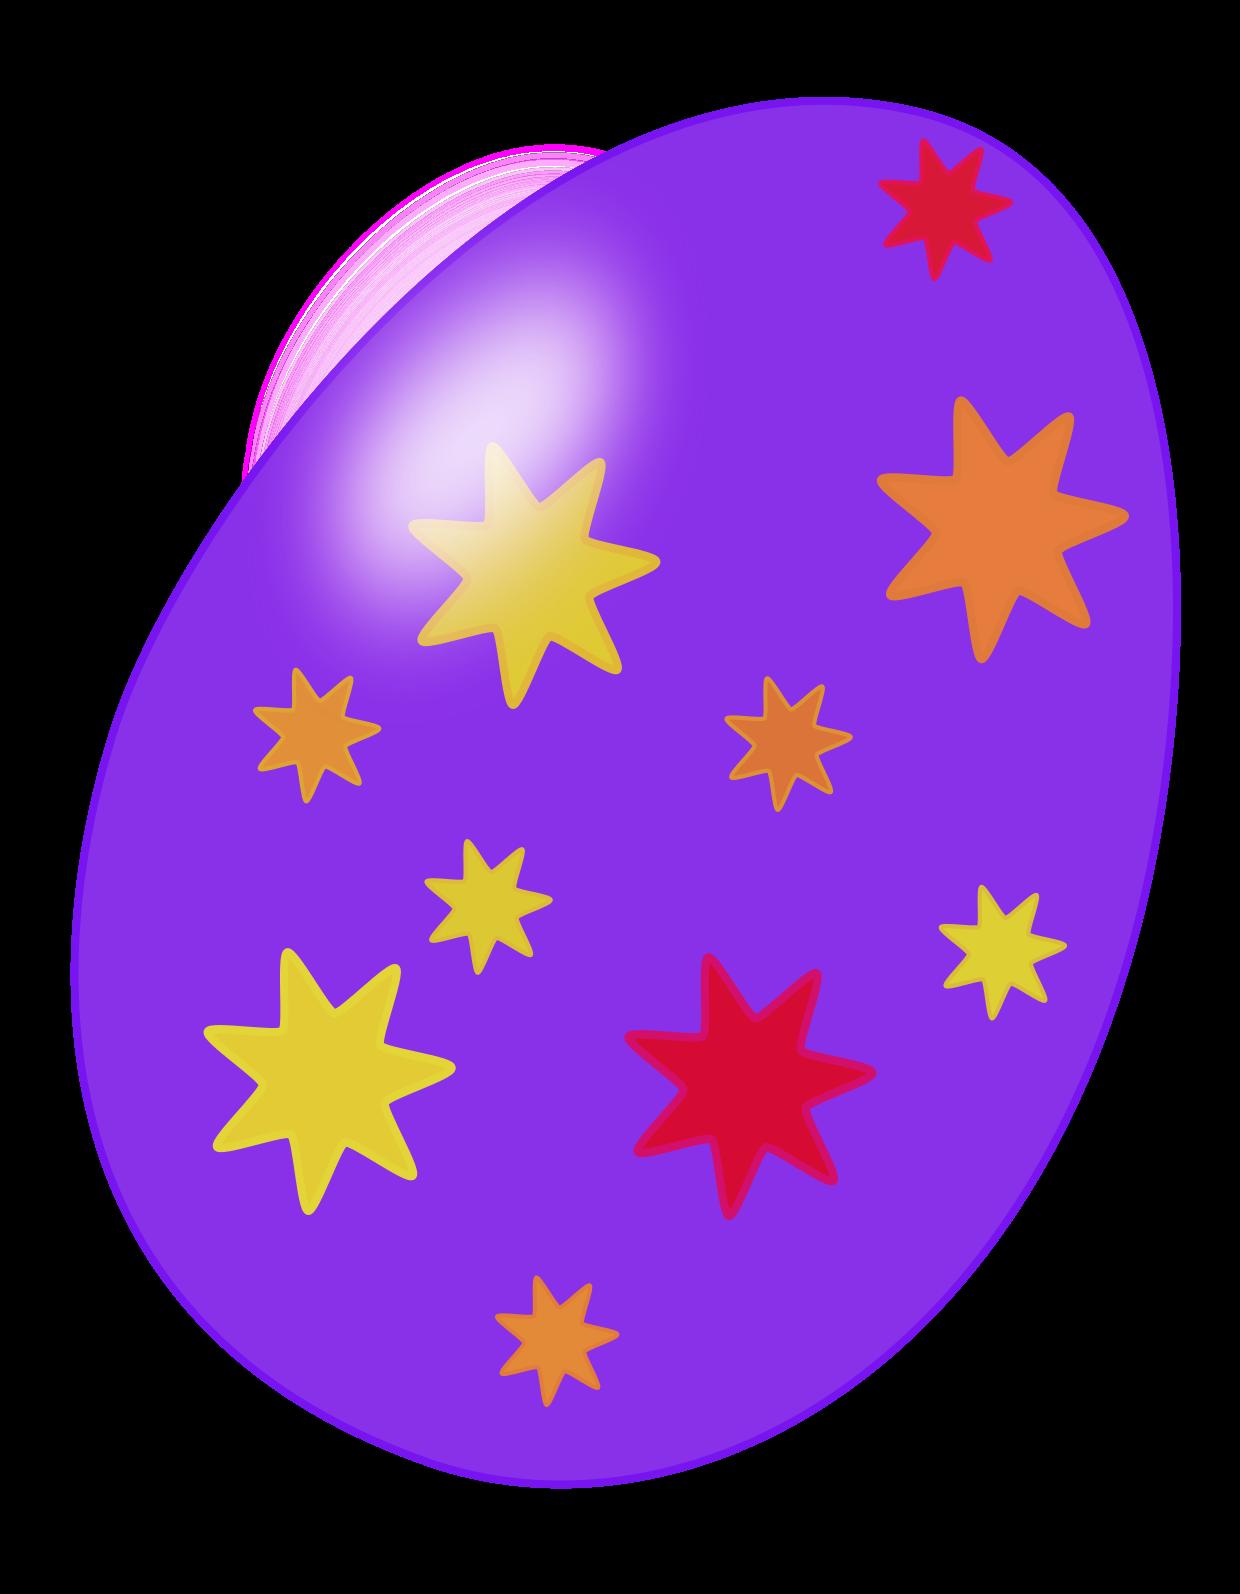 1240x1594 Easter Egg Clipart Clipart Panda